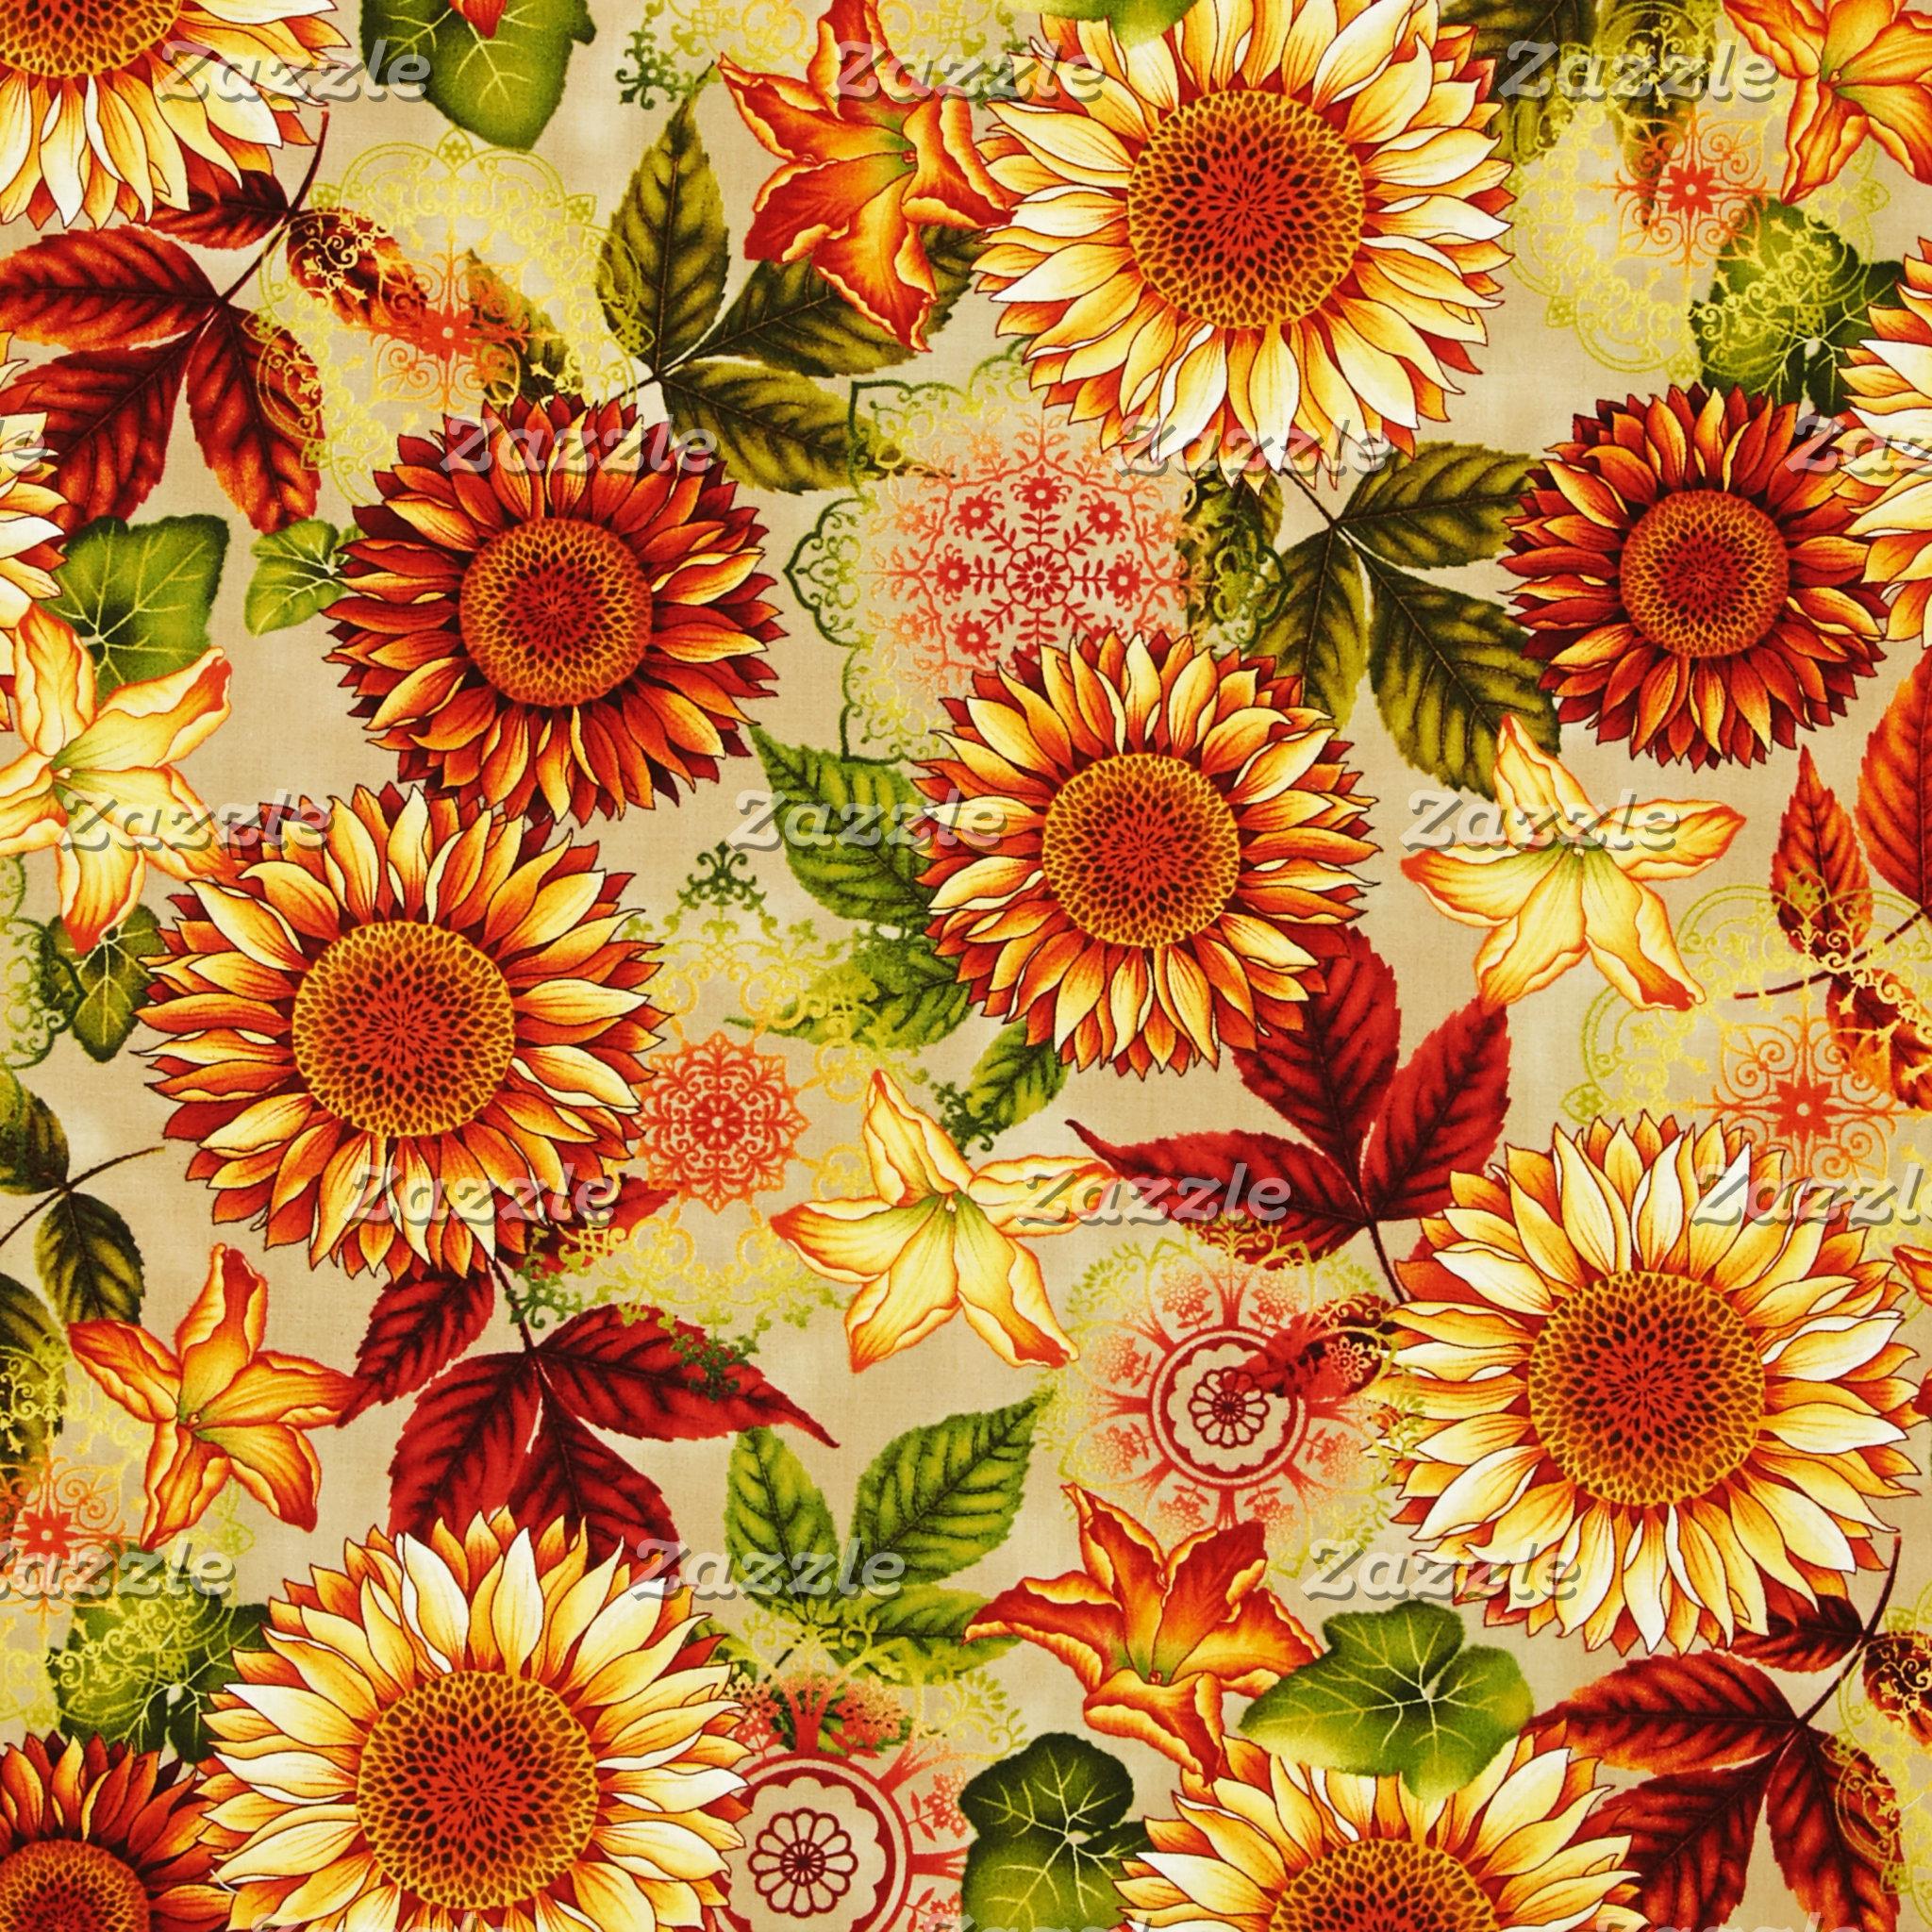 *Floral, Flowers, Foliage